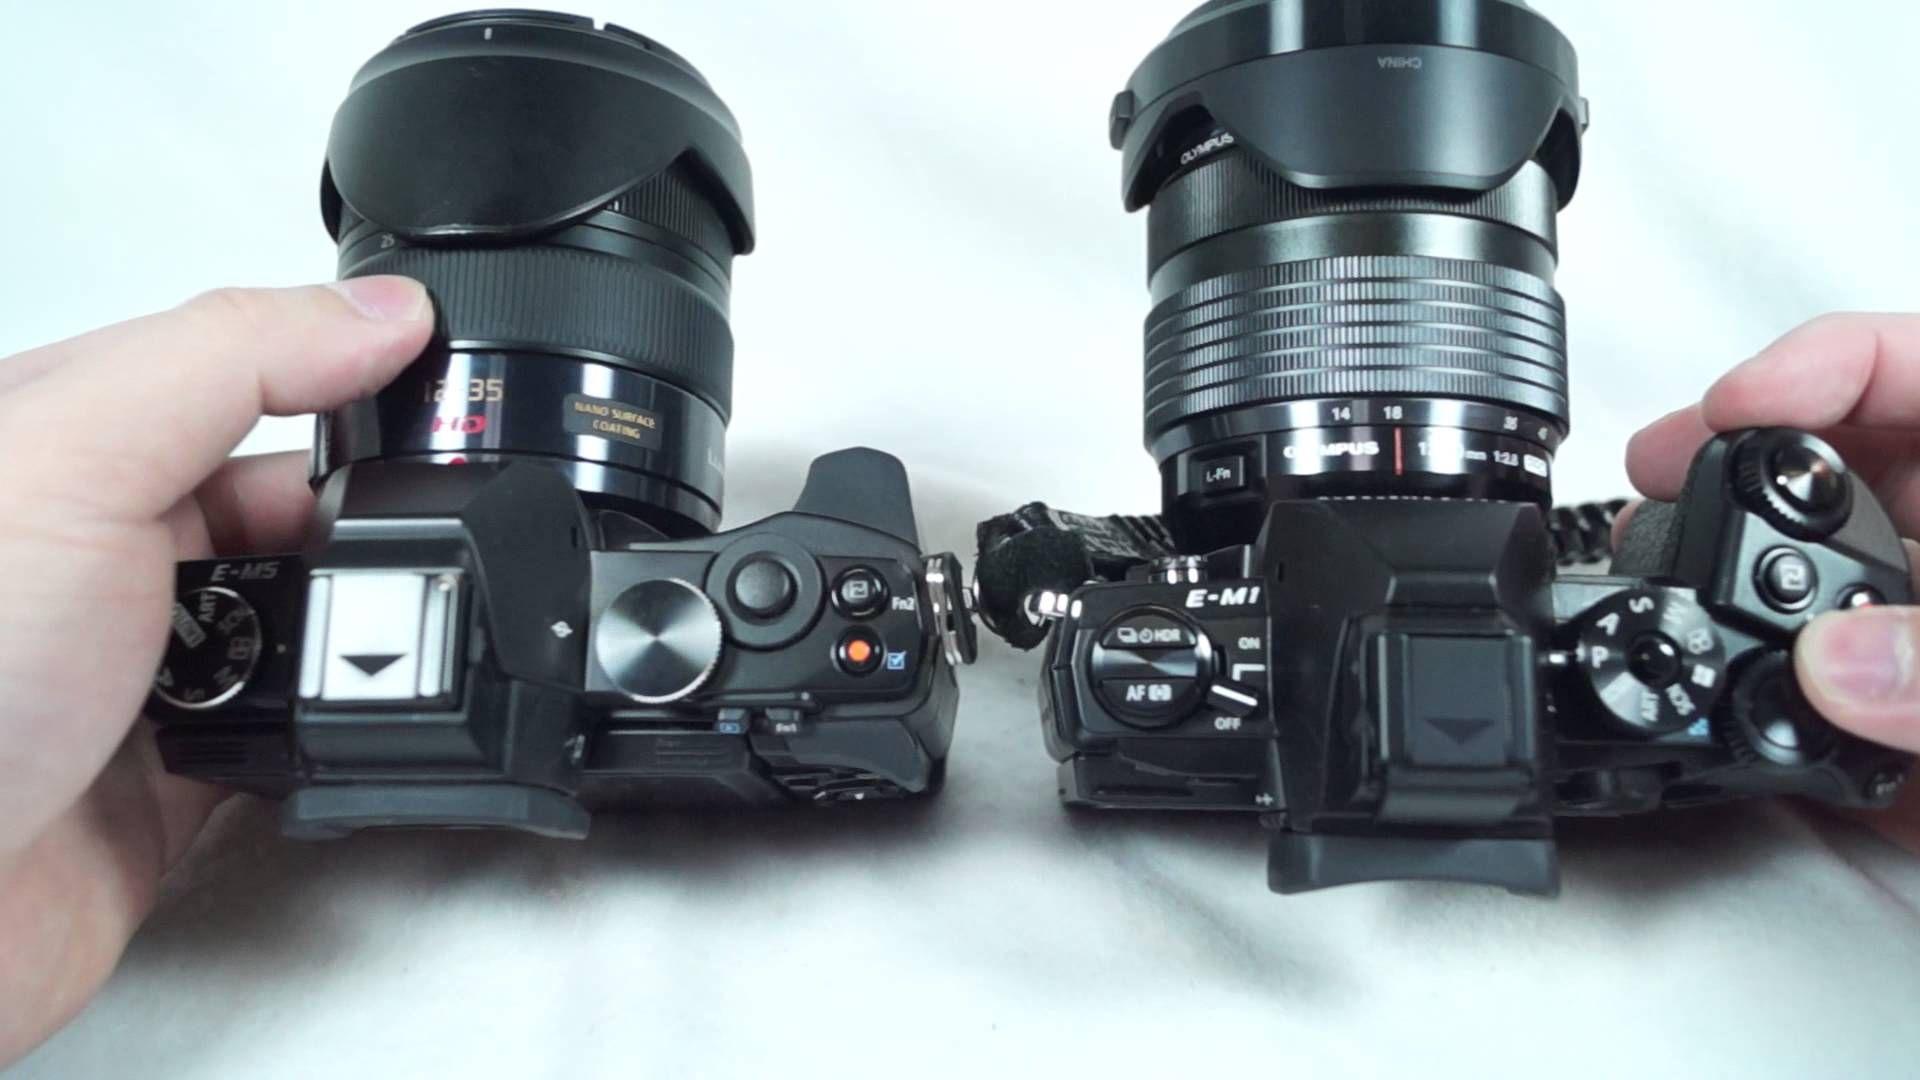 Olympus Omd Em1 Vs Em5 Size Comparison With Panasonic 12 35 Olympus 1 Olympus Camera Olympus Photo Gear